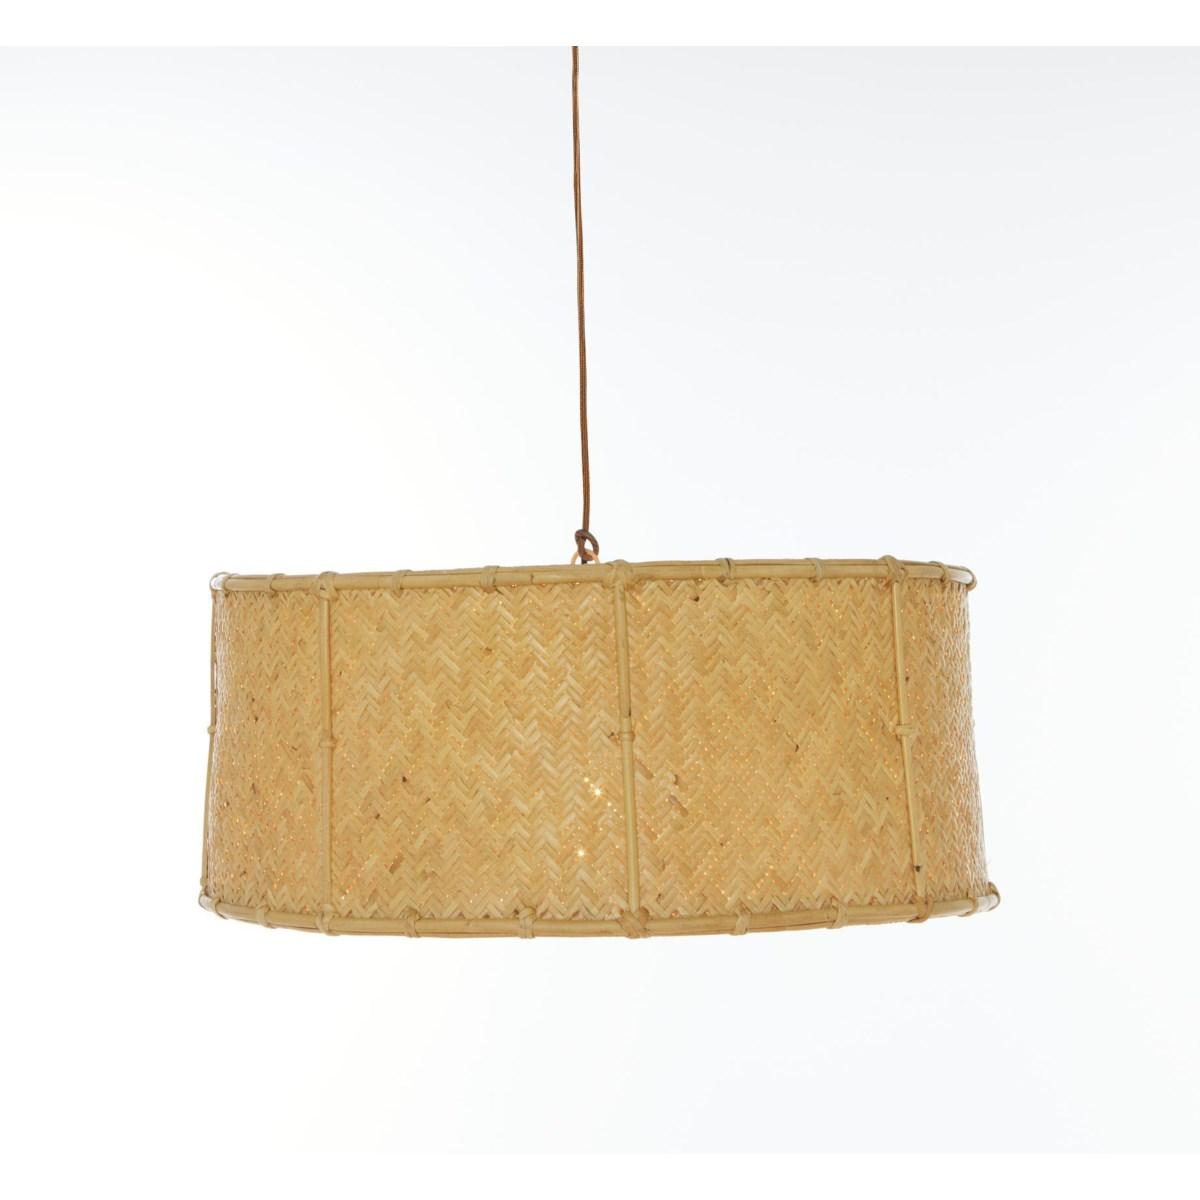 Drum Pendant Herringbone Pattern Weave Color - Natural (hardwired pendant kit included; 60W)CLO